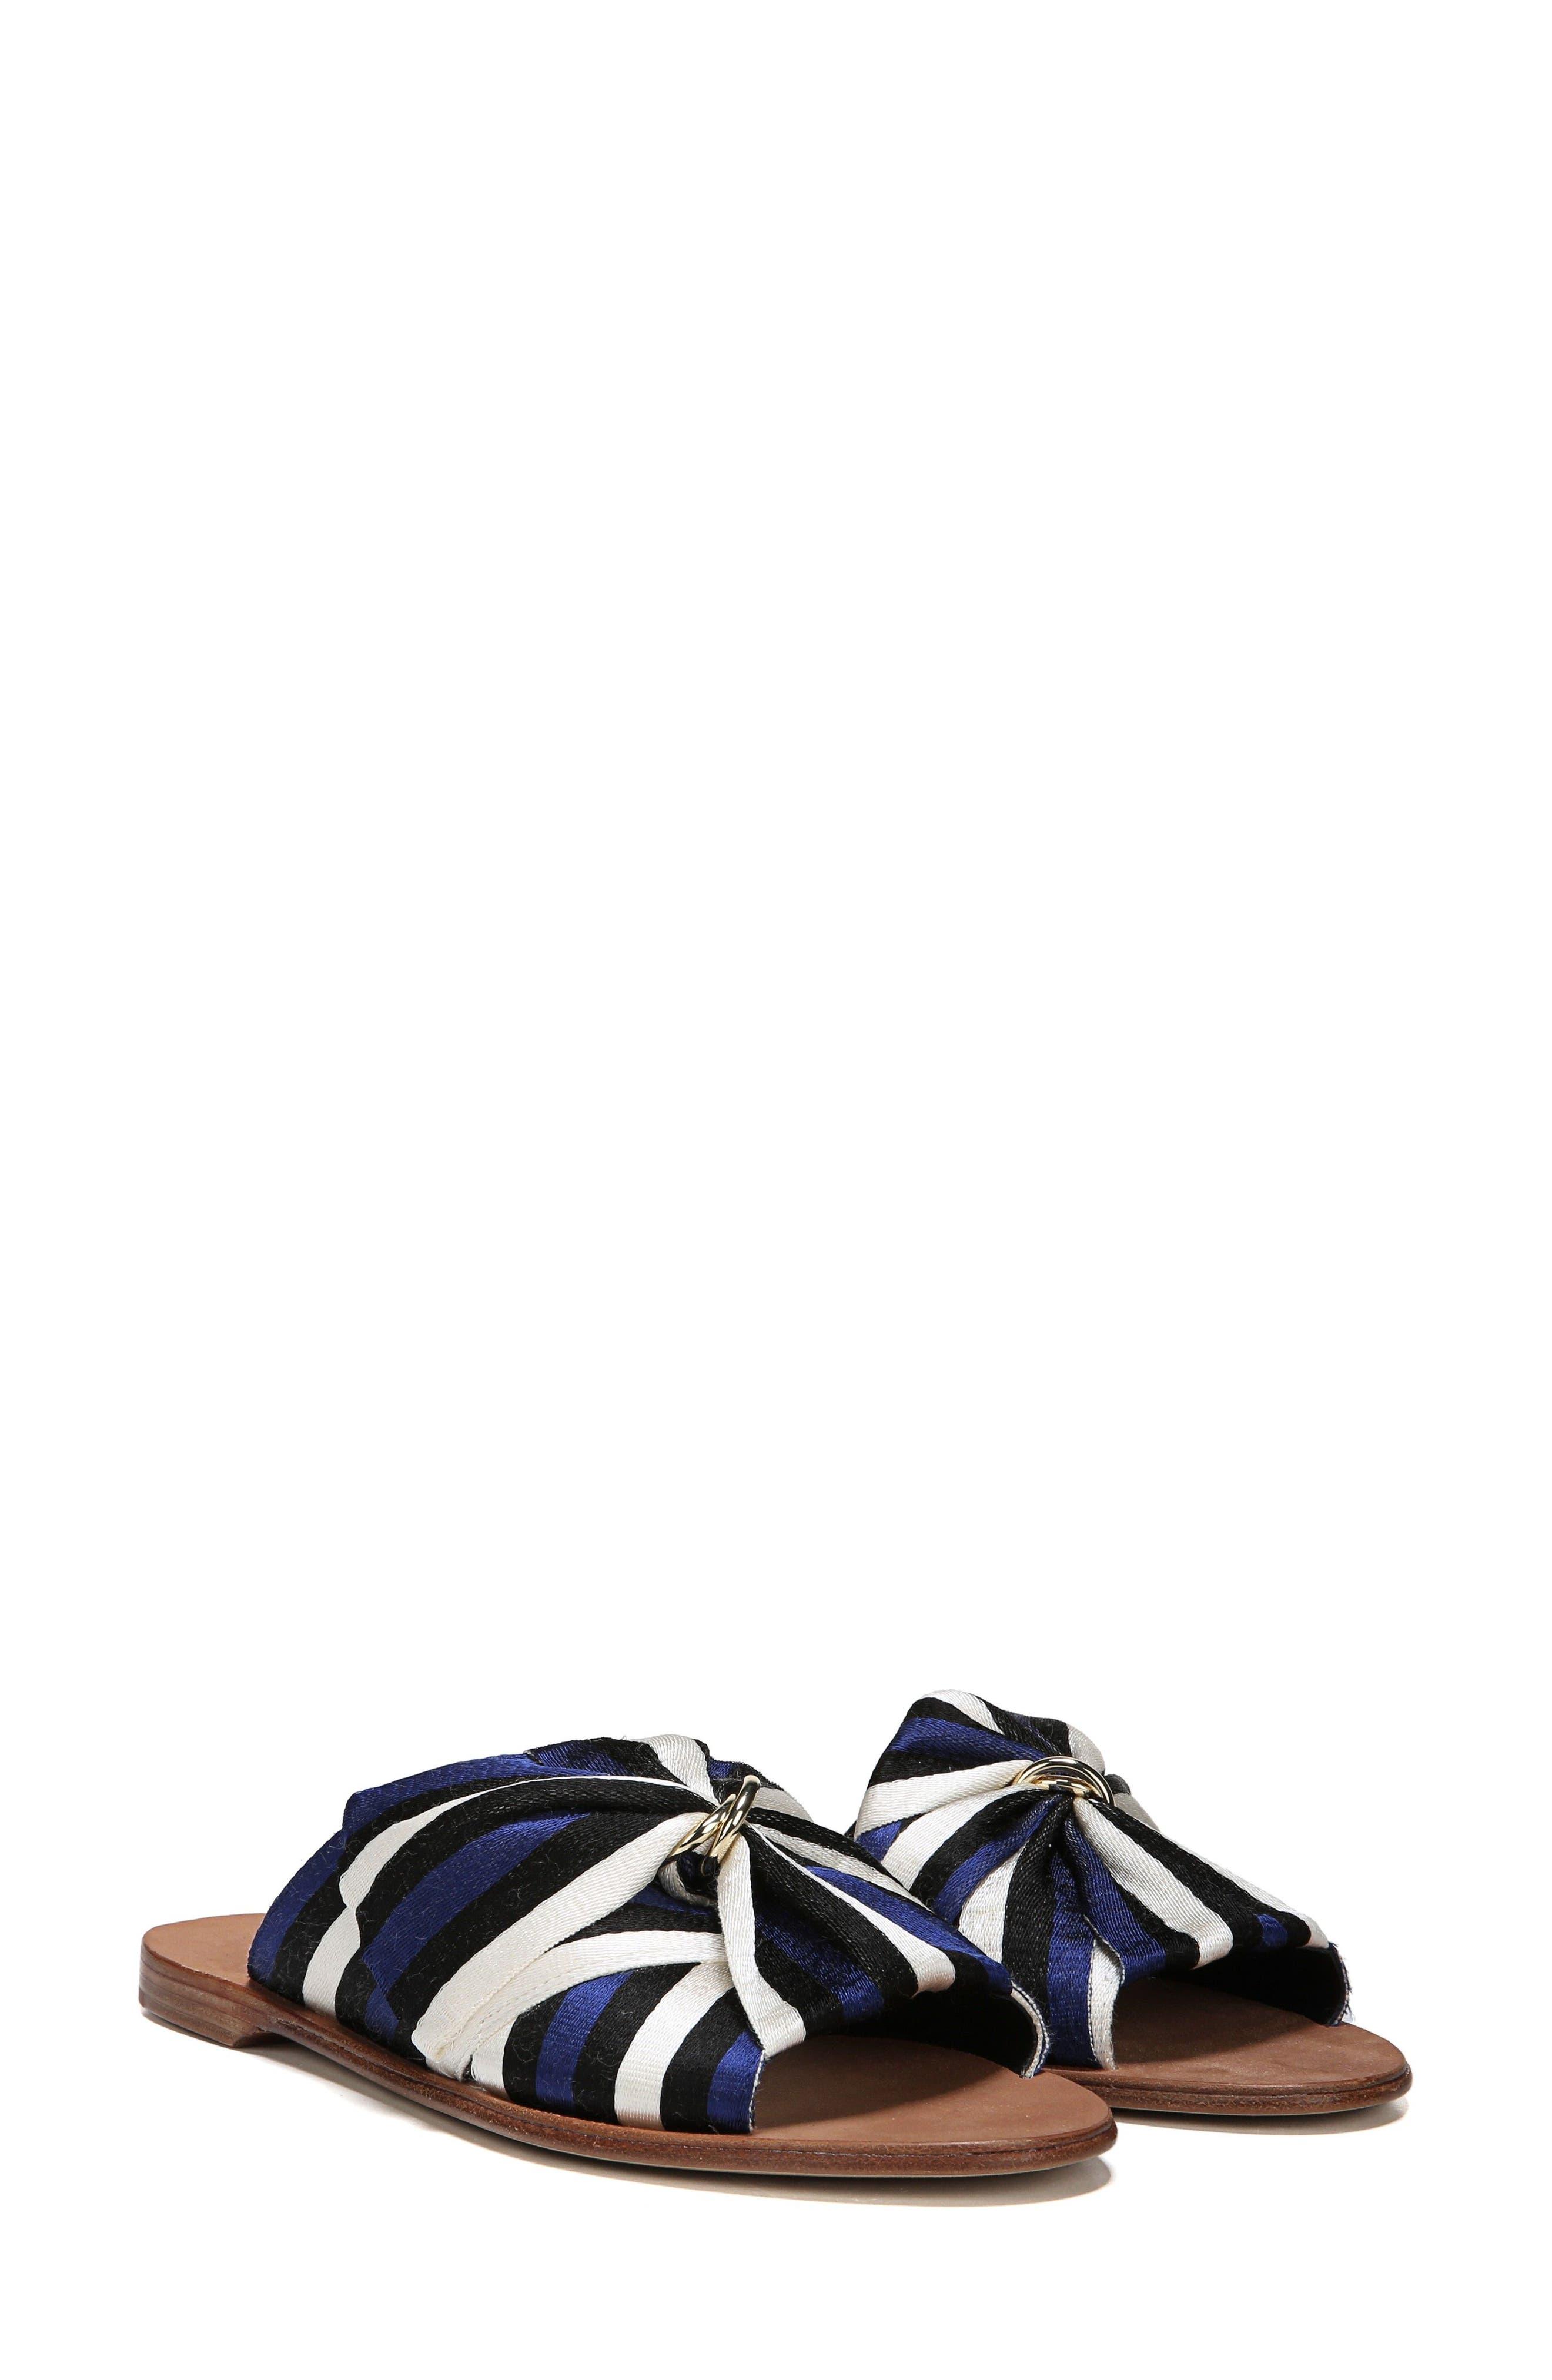 Bella Asymmetrical Slide Sandal,                             Alternate thumbnail 7, color,                             400